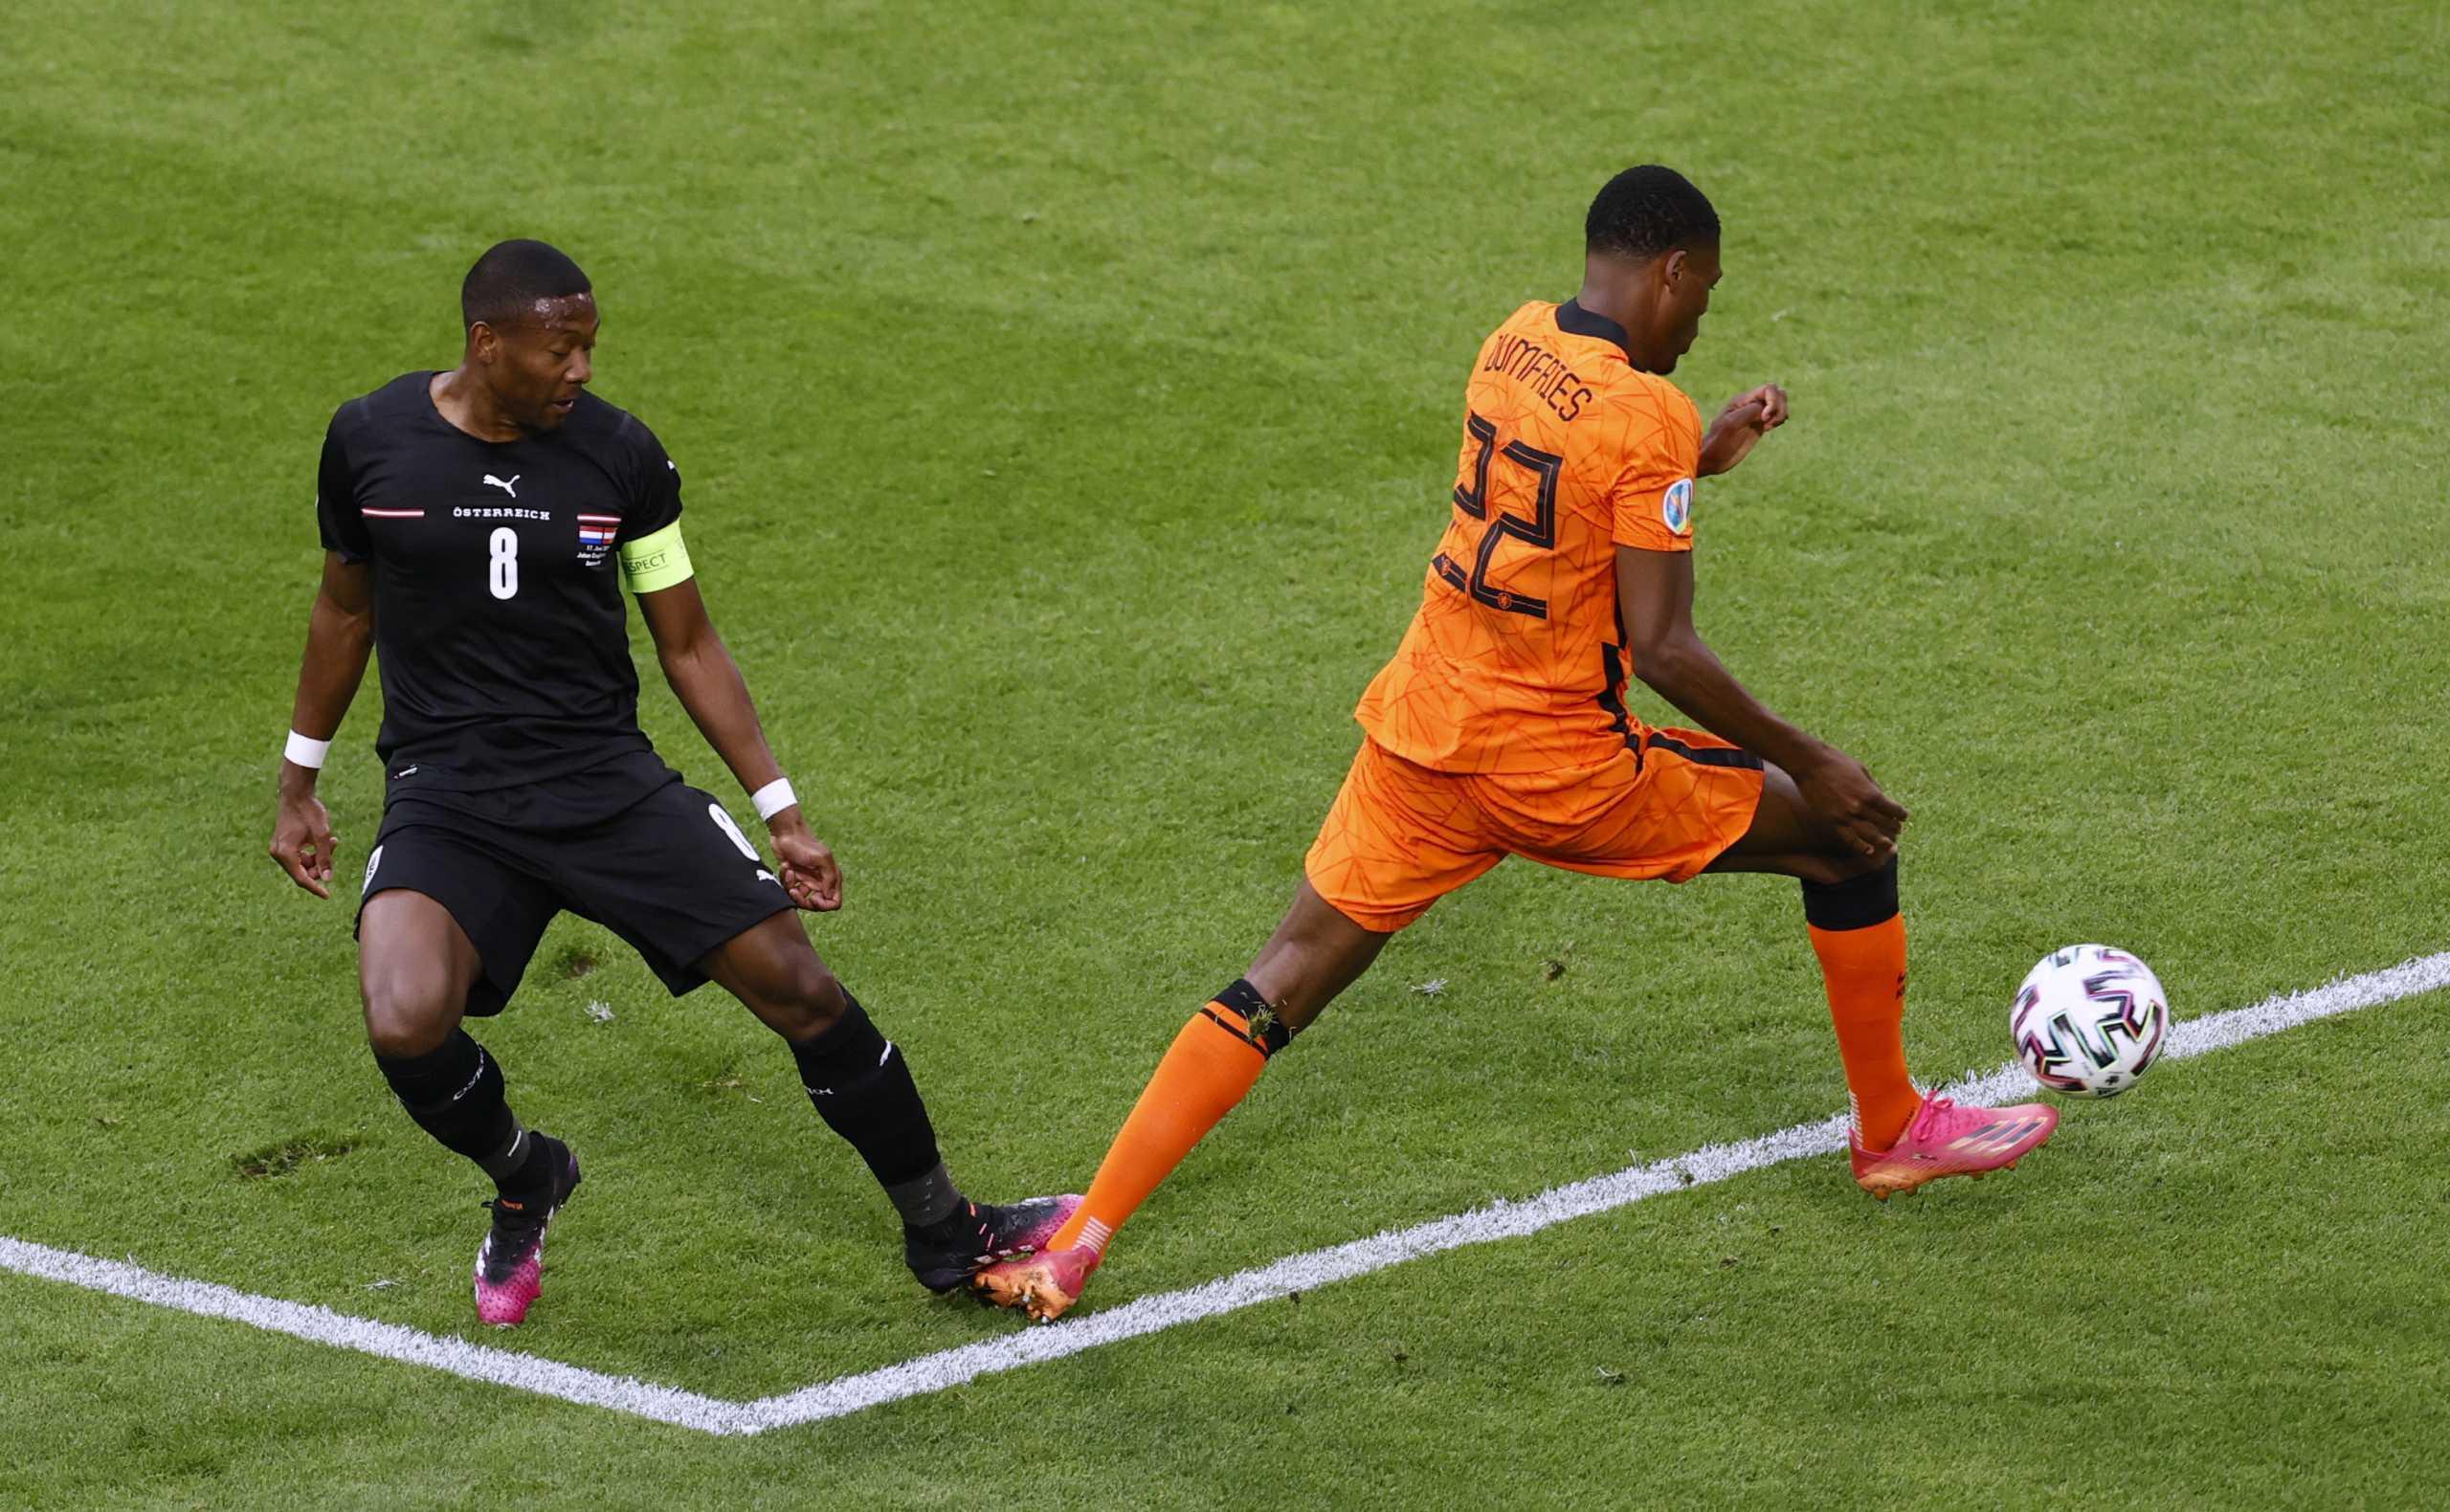 Euro 2020, Ολλανδία – Αυστρία: Οριακό πέναλτι του Αλάμπα δόθηκε μέσω VAR